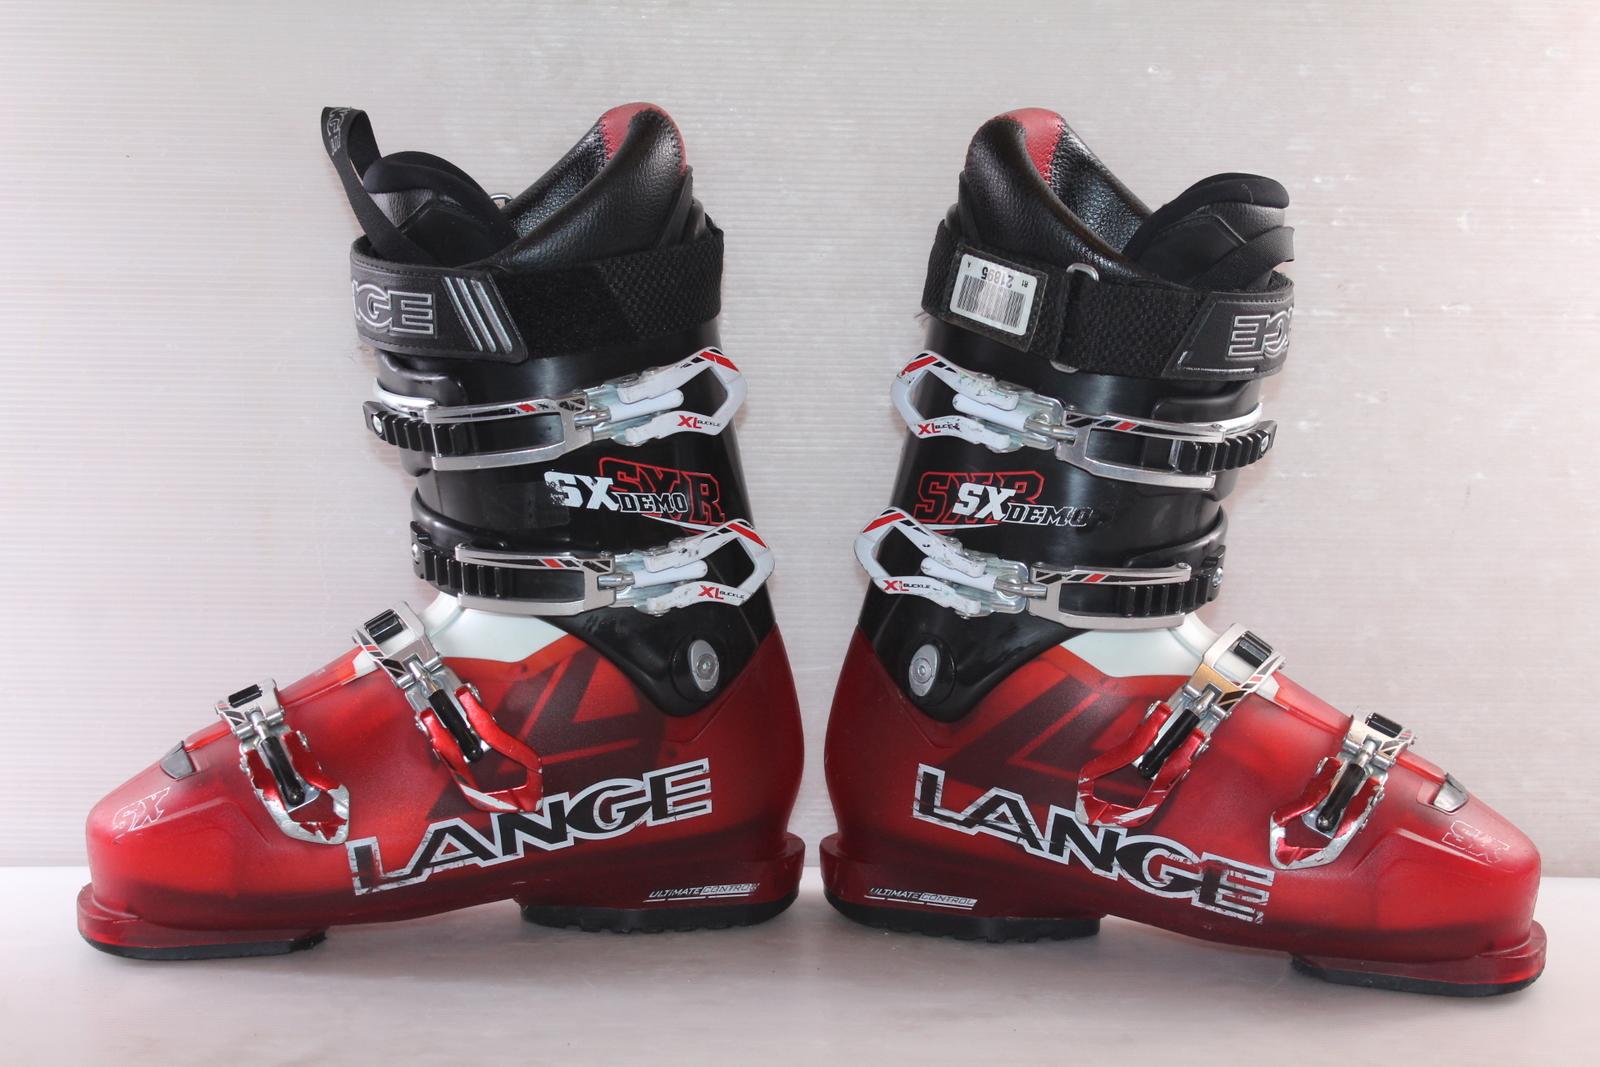 Lyžařské boty Lange SX Demo vel. EU41 flexe 85